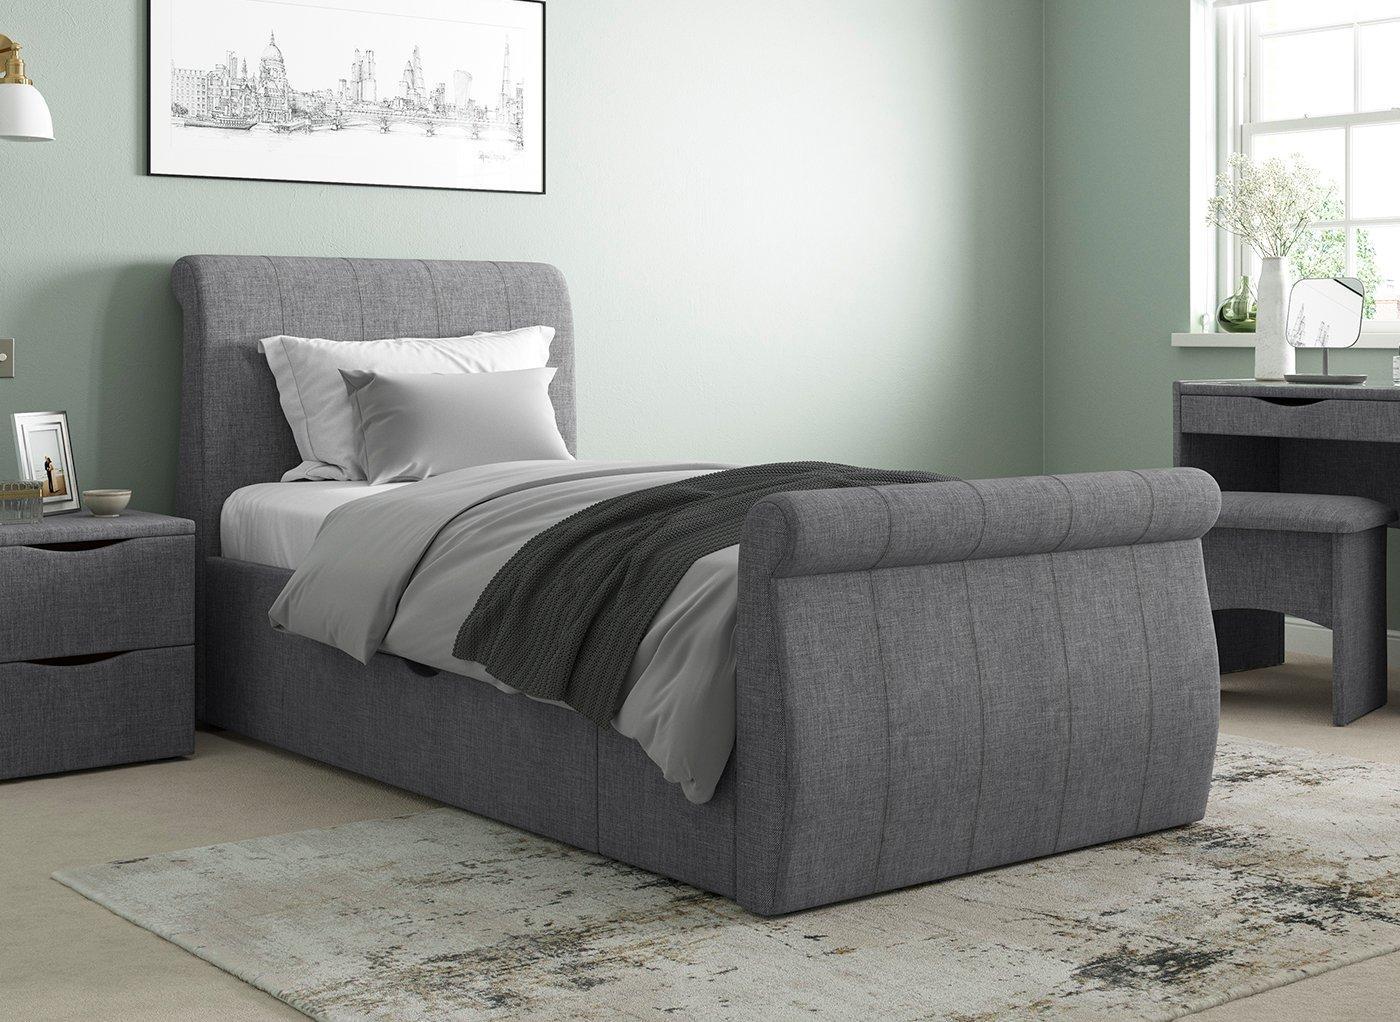 lucia-upholstered-bed-frame